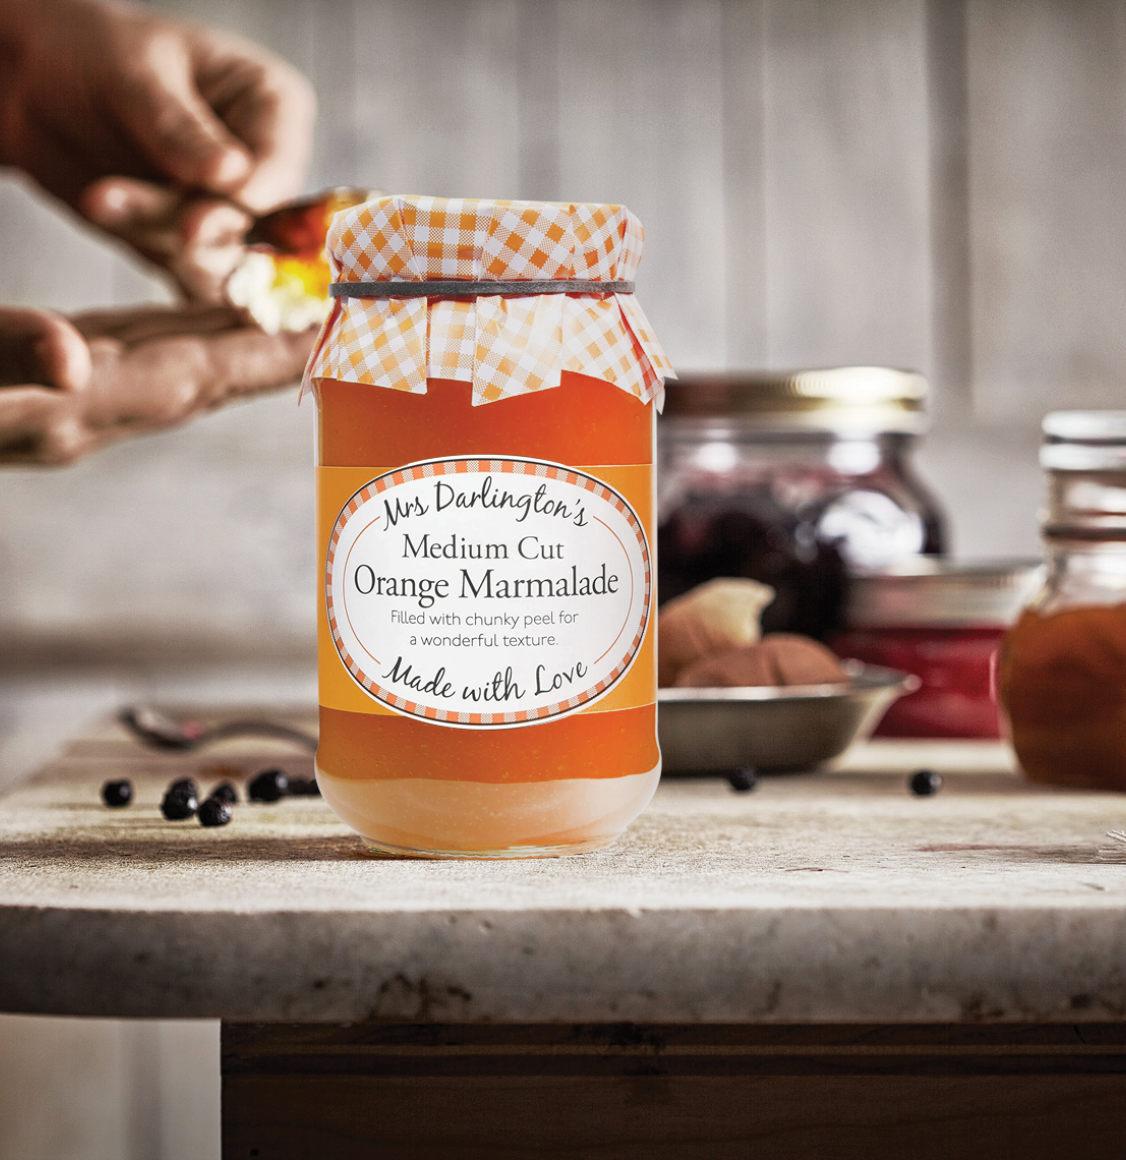 Mrs Darlington's Medium Cut Μαρμελάδα Πορτοκαλιού